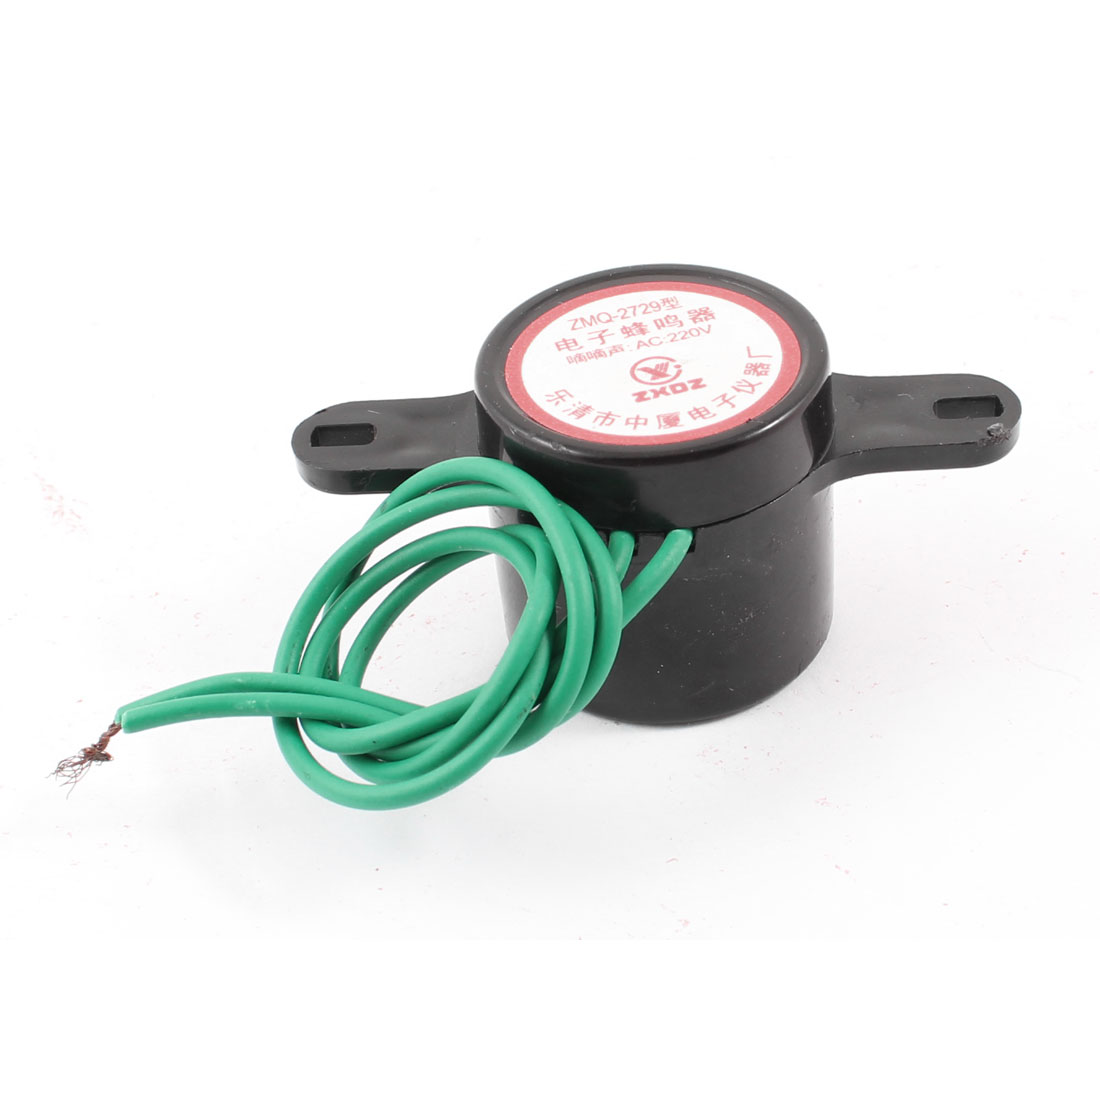 ZMQ-2729 AC 110/220V Industrial Beep Sound Electronic Buzzer